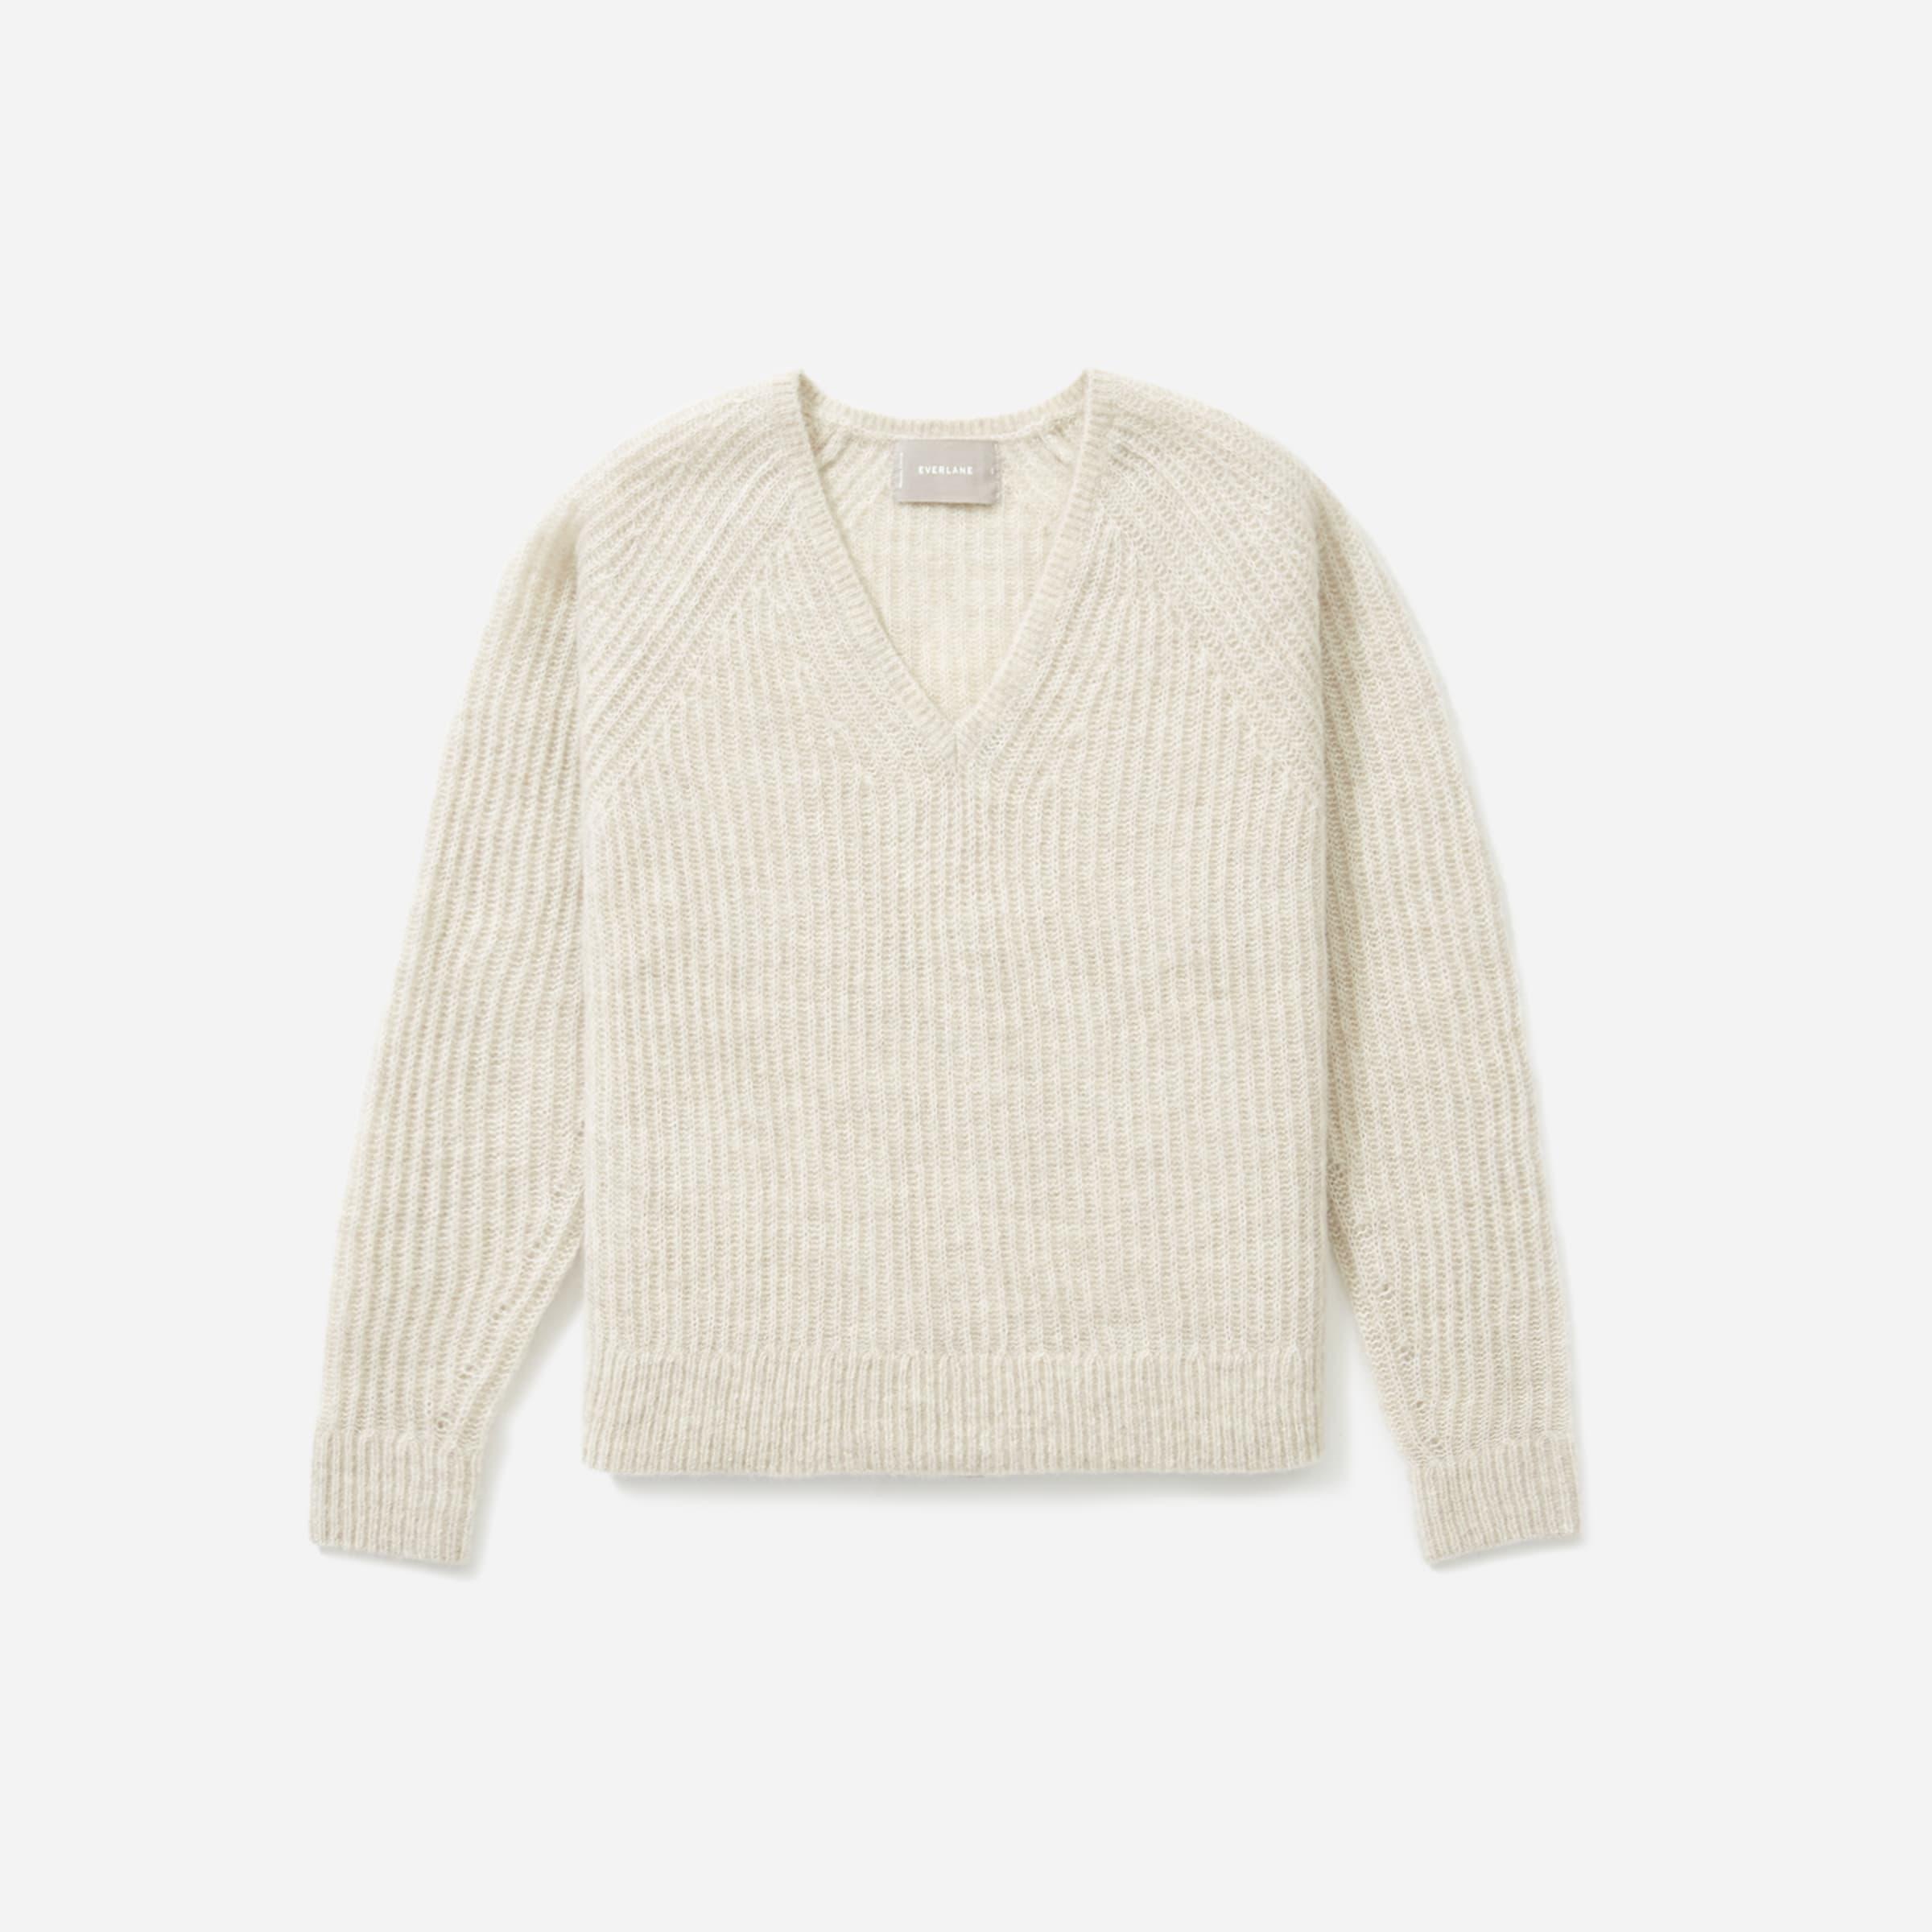 The Alpaca V-Neck Sweater | Everlane